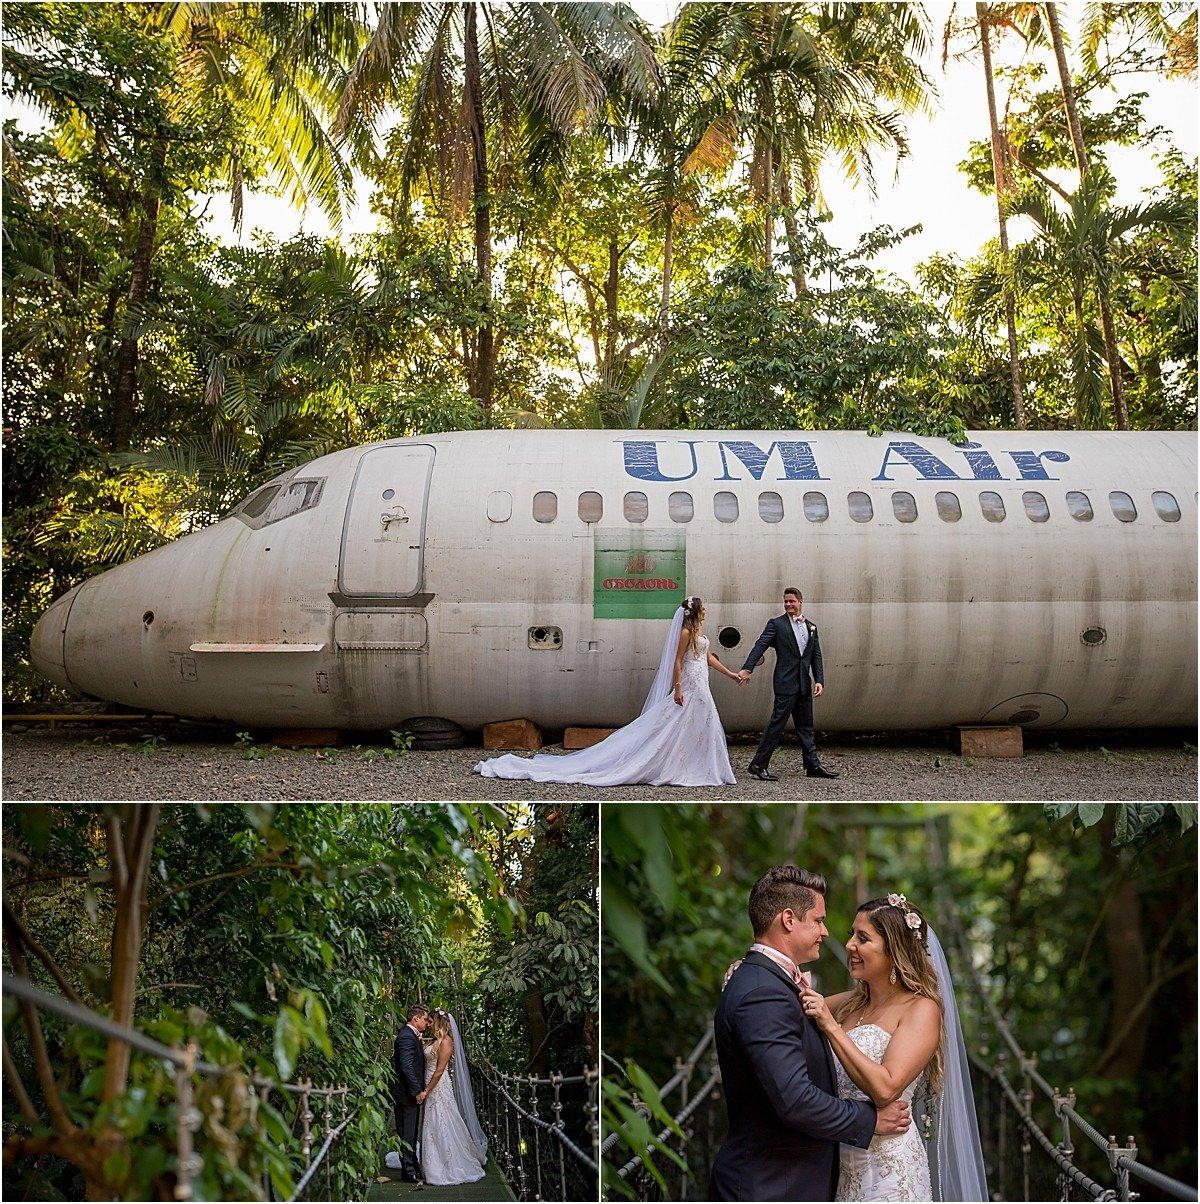 crashed airplane in jungle of Costa Rica